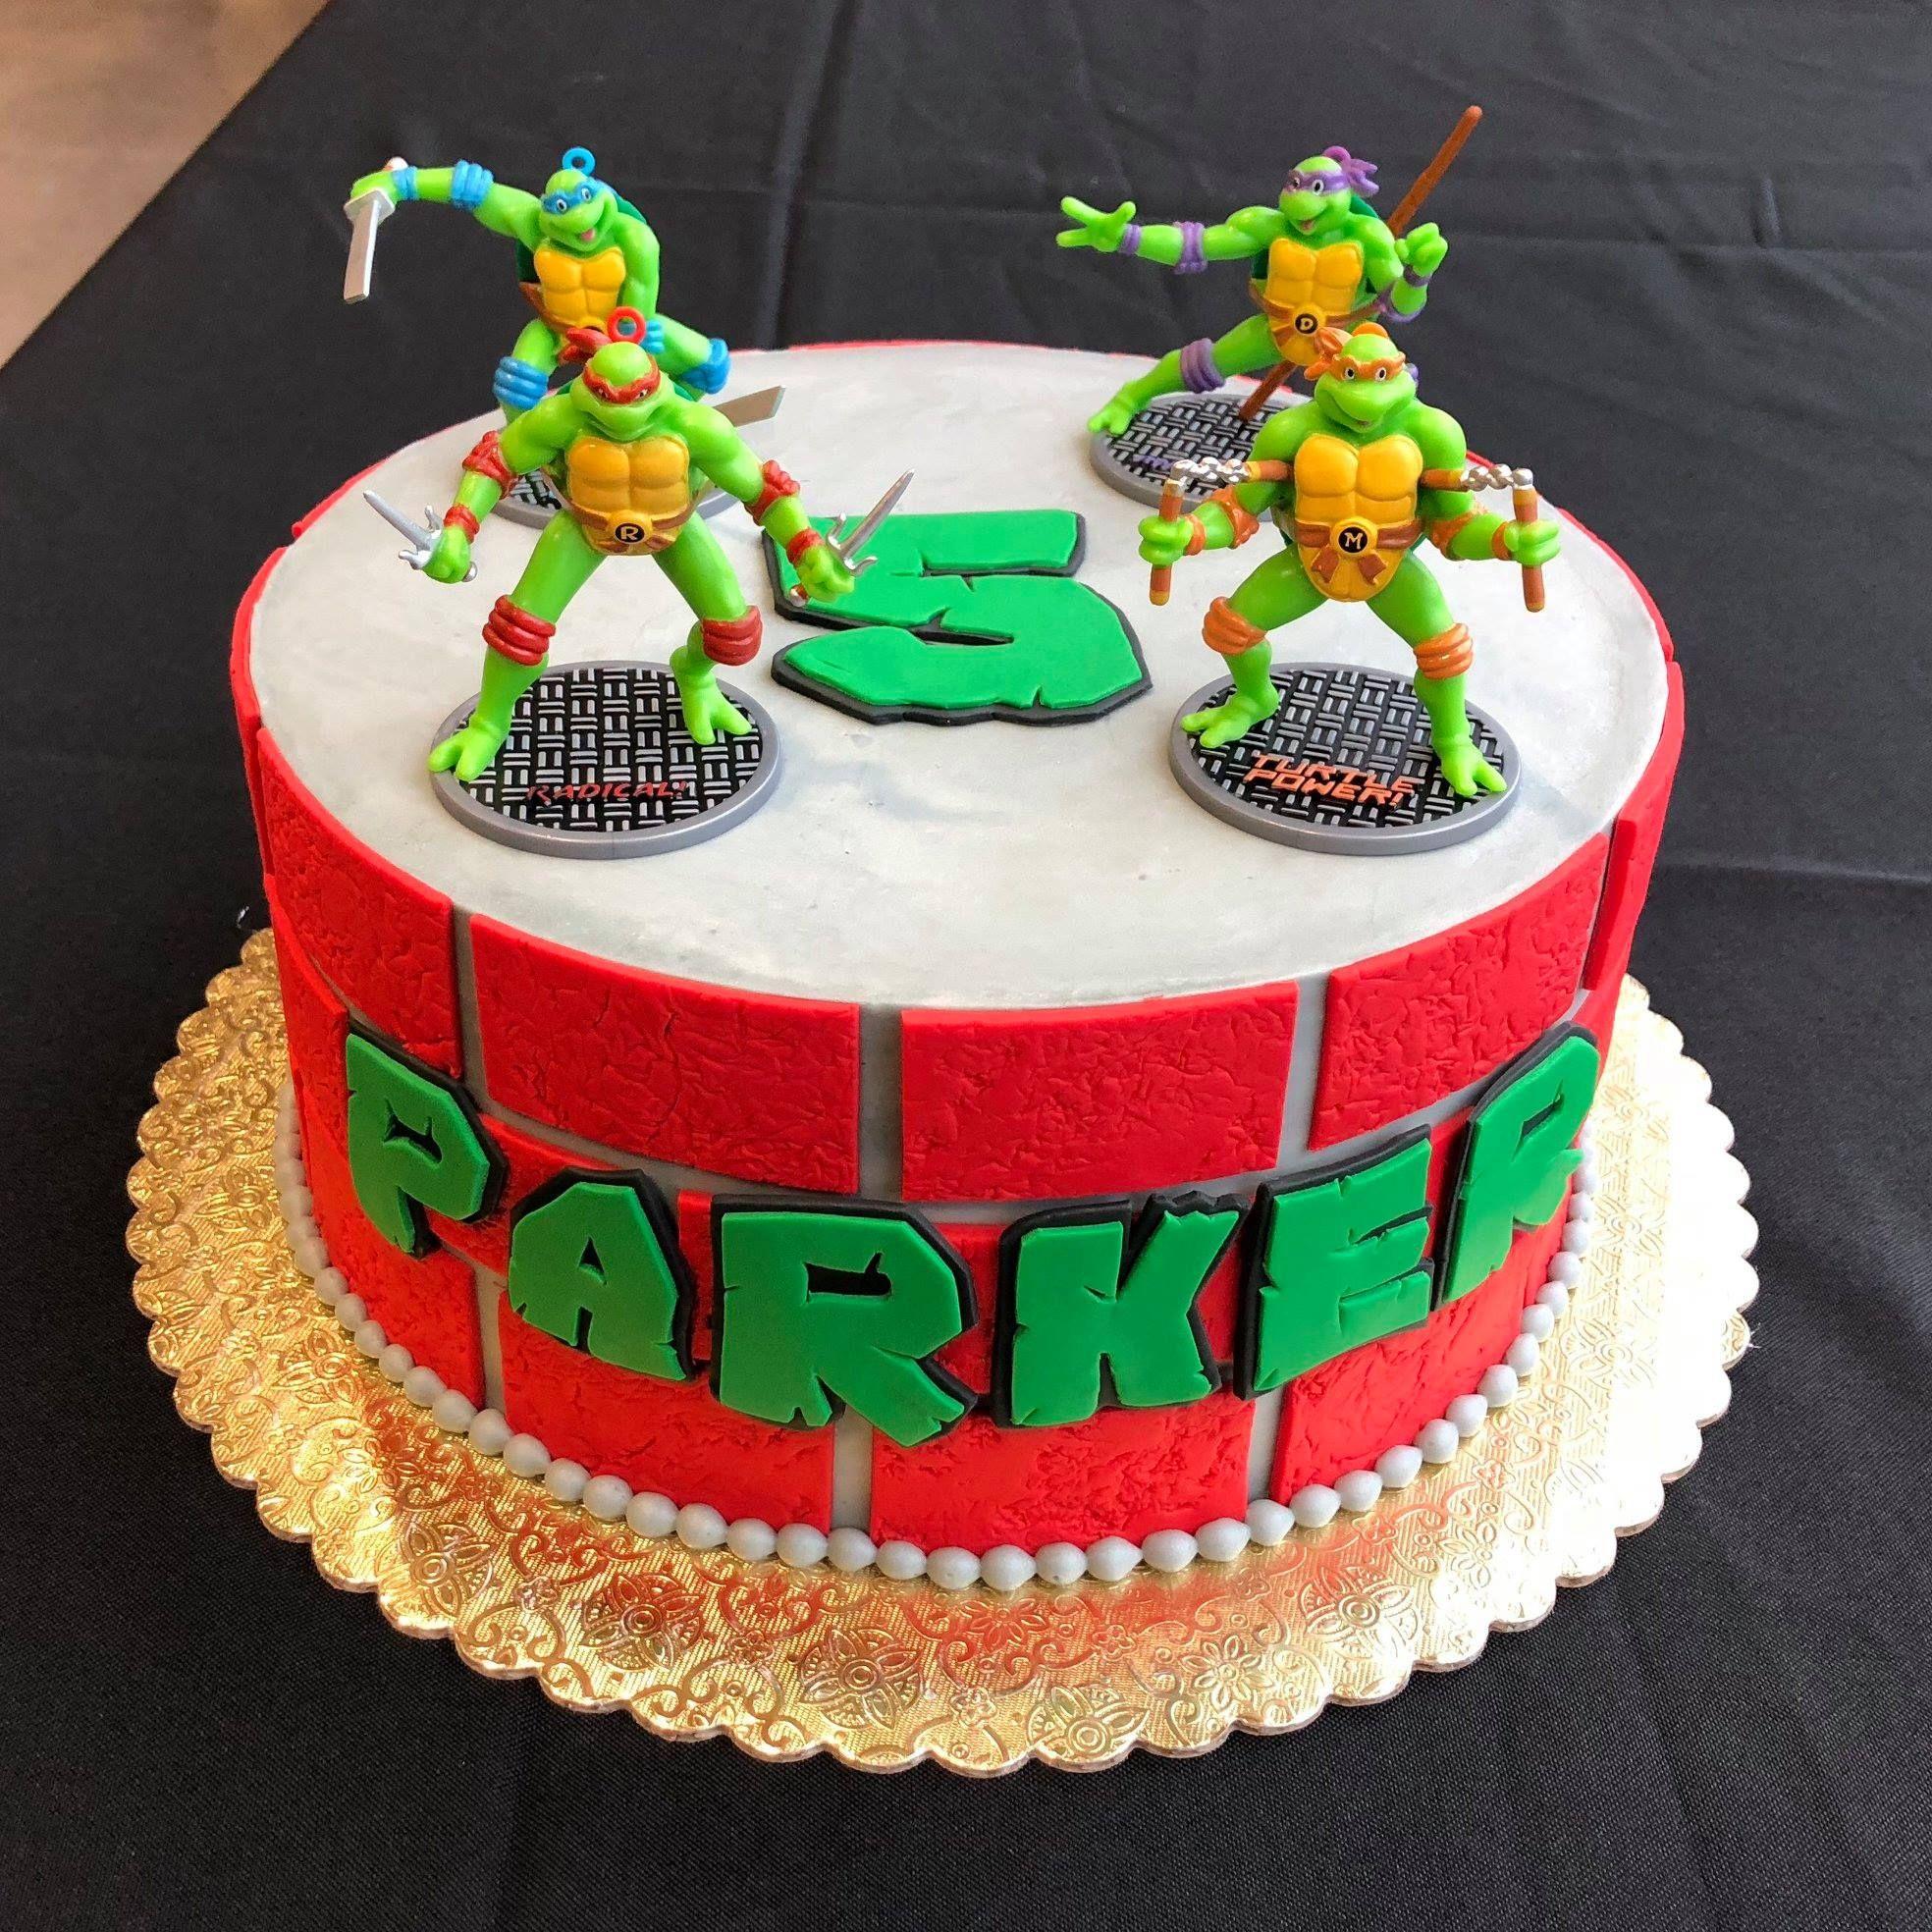 A Teenage Mutant Ninja Turtles Cake For Parker S 5th Birthday Boy Birthday Cake Ninja Turtle Cake Cake